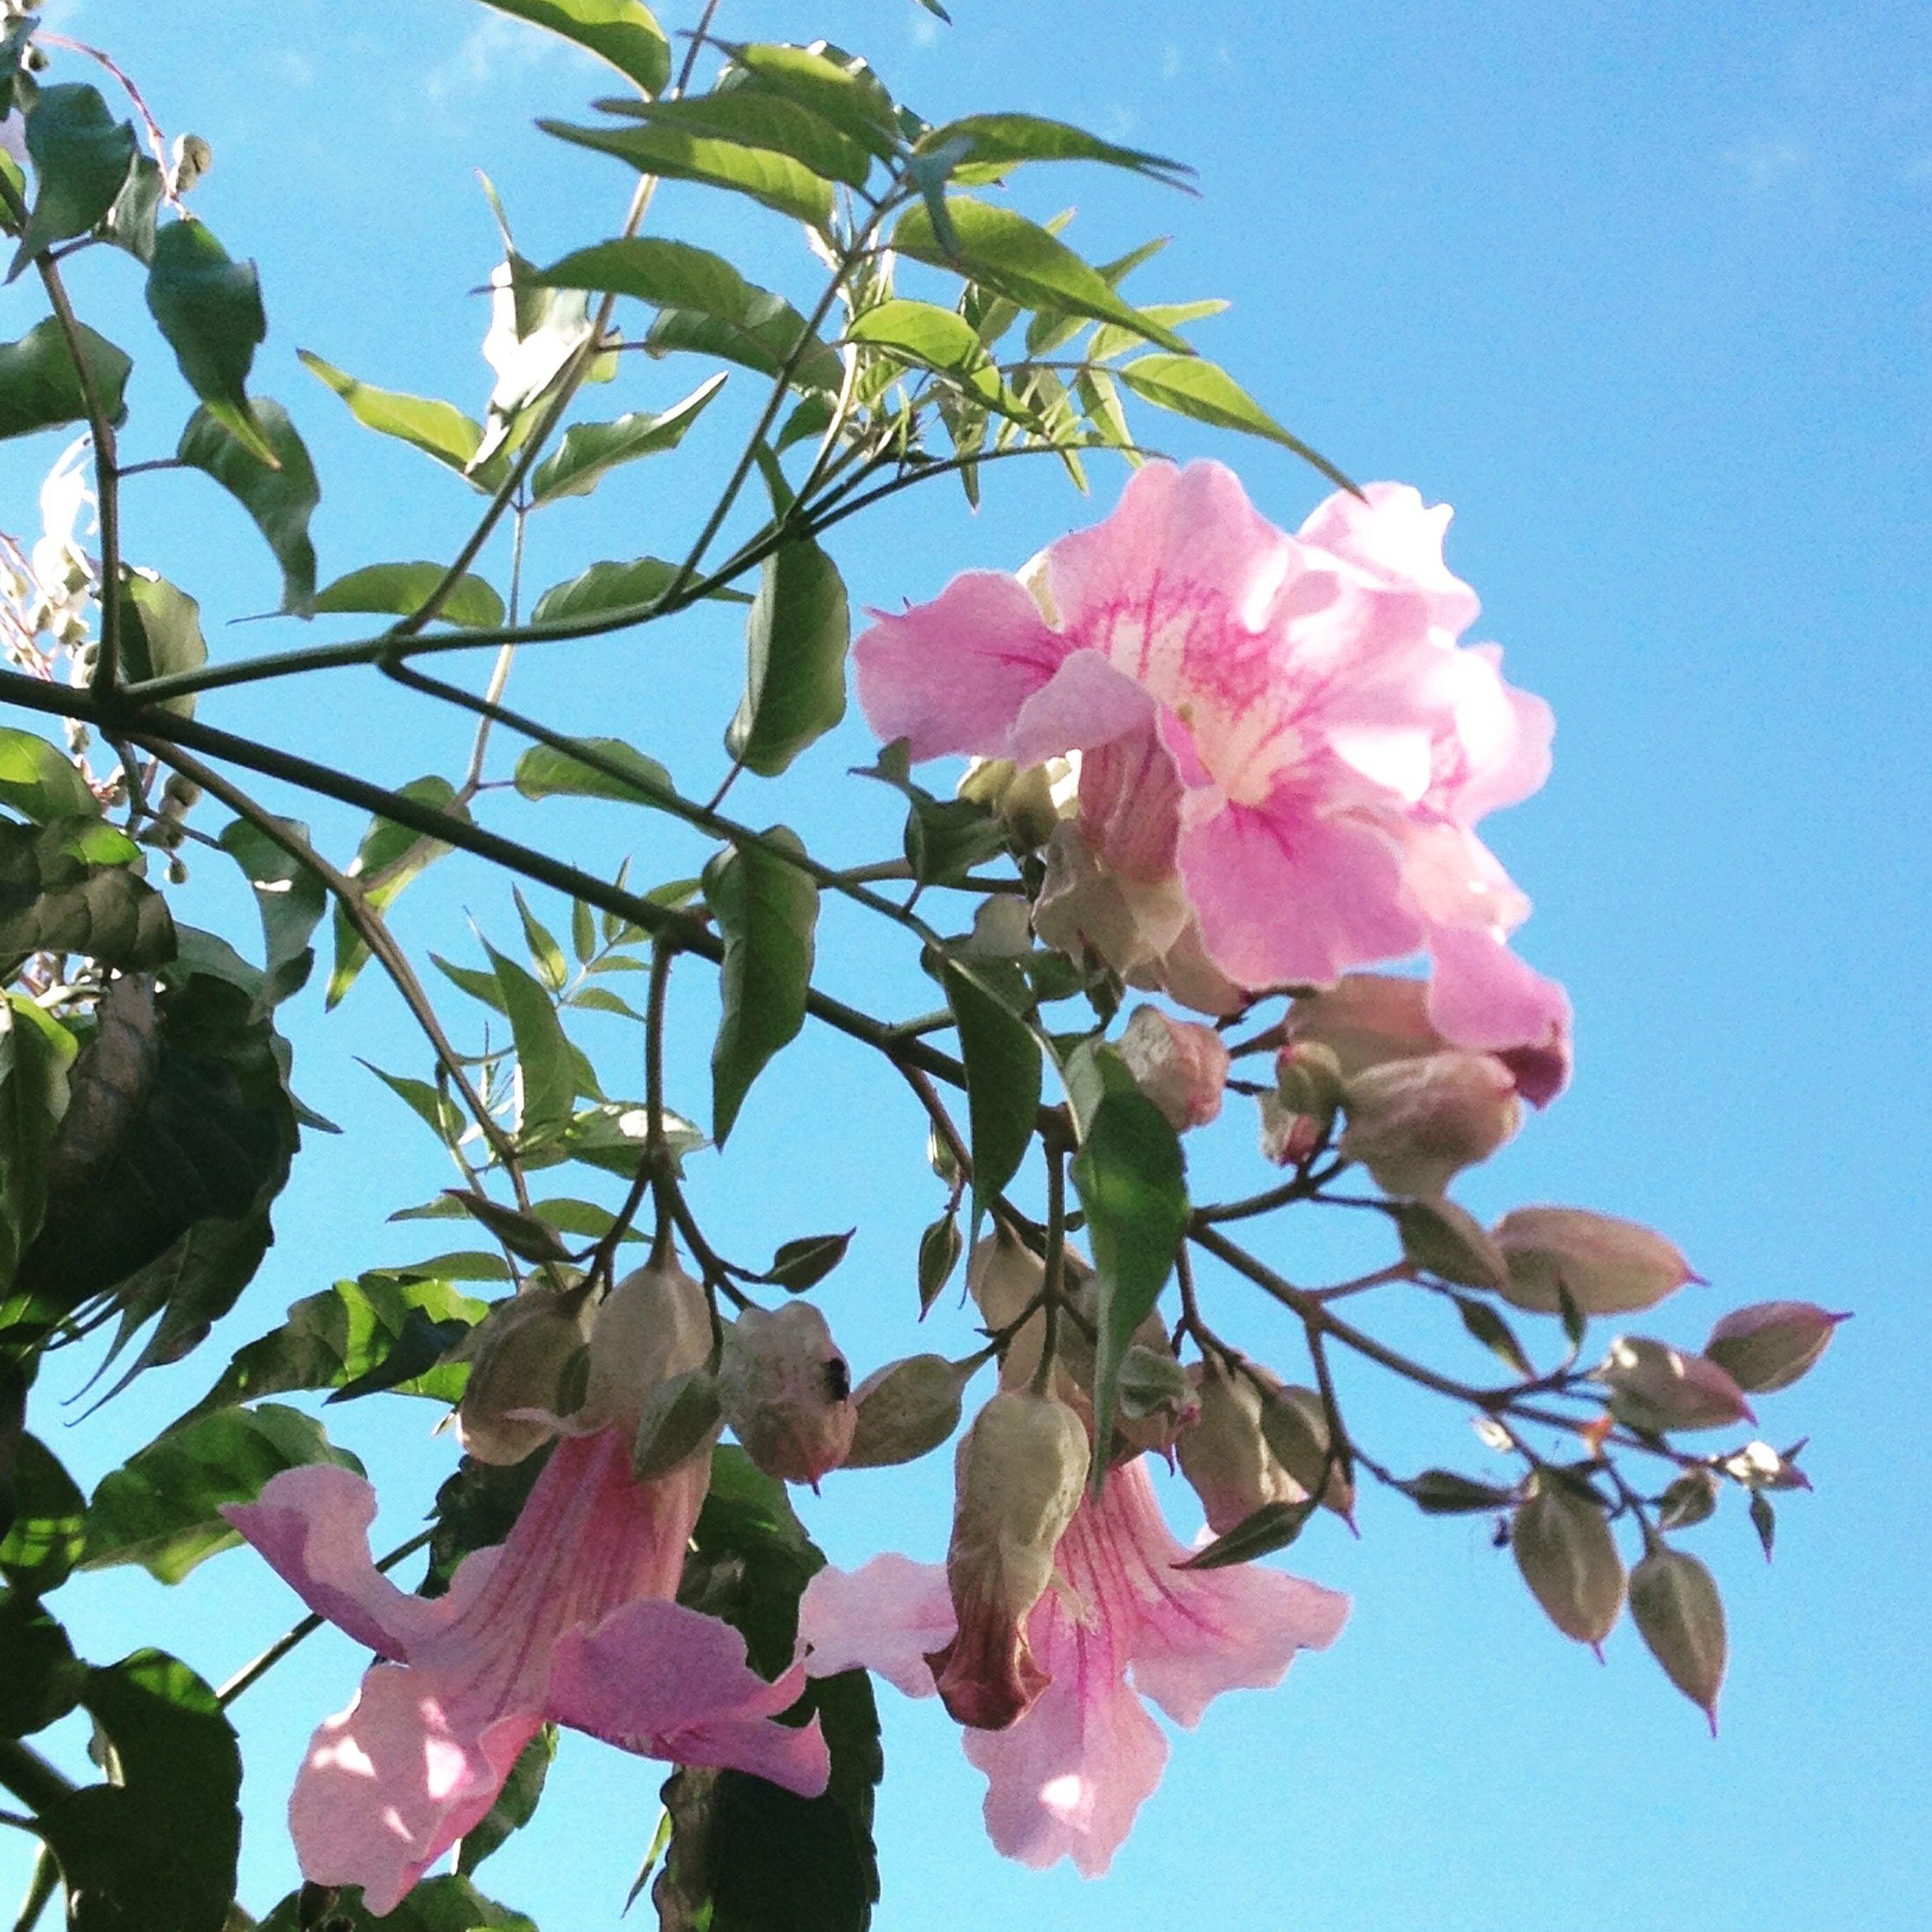 Verde e Rosa num Céu Azul - Foto de Malú Antunes